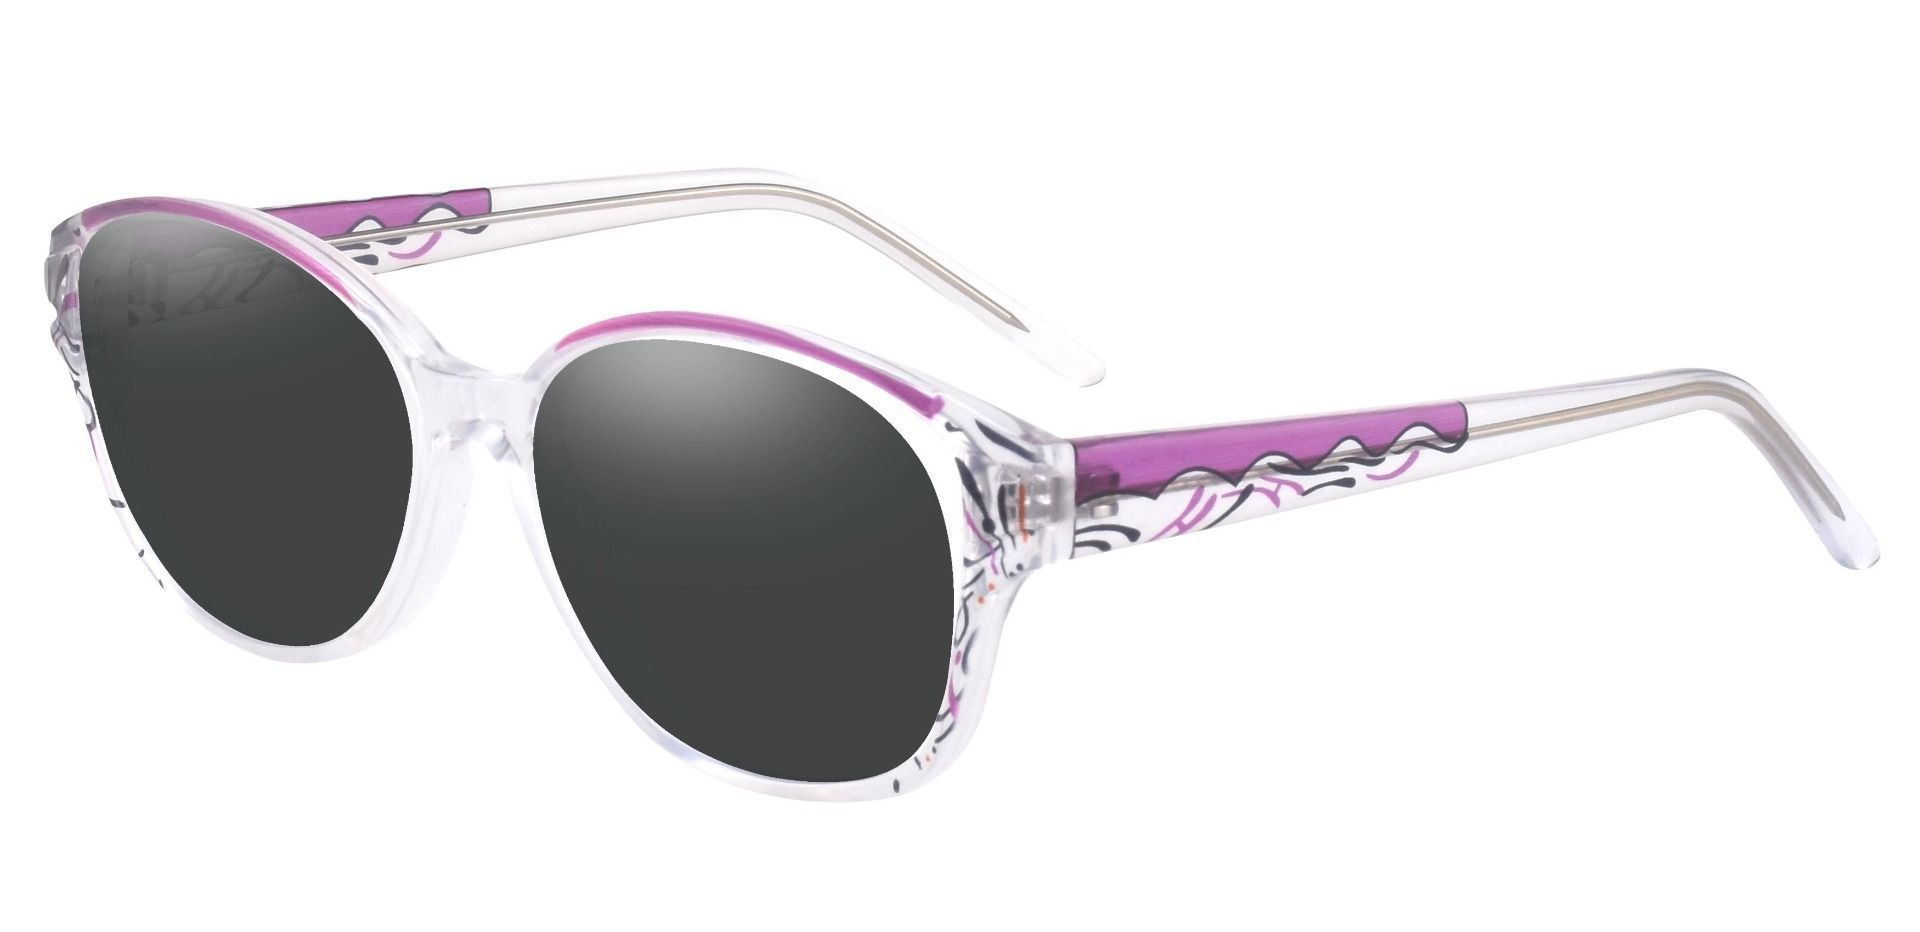 Price Oval Prescription Sunglasses - Purple Frame With Gray Lenses